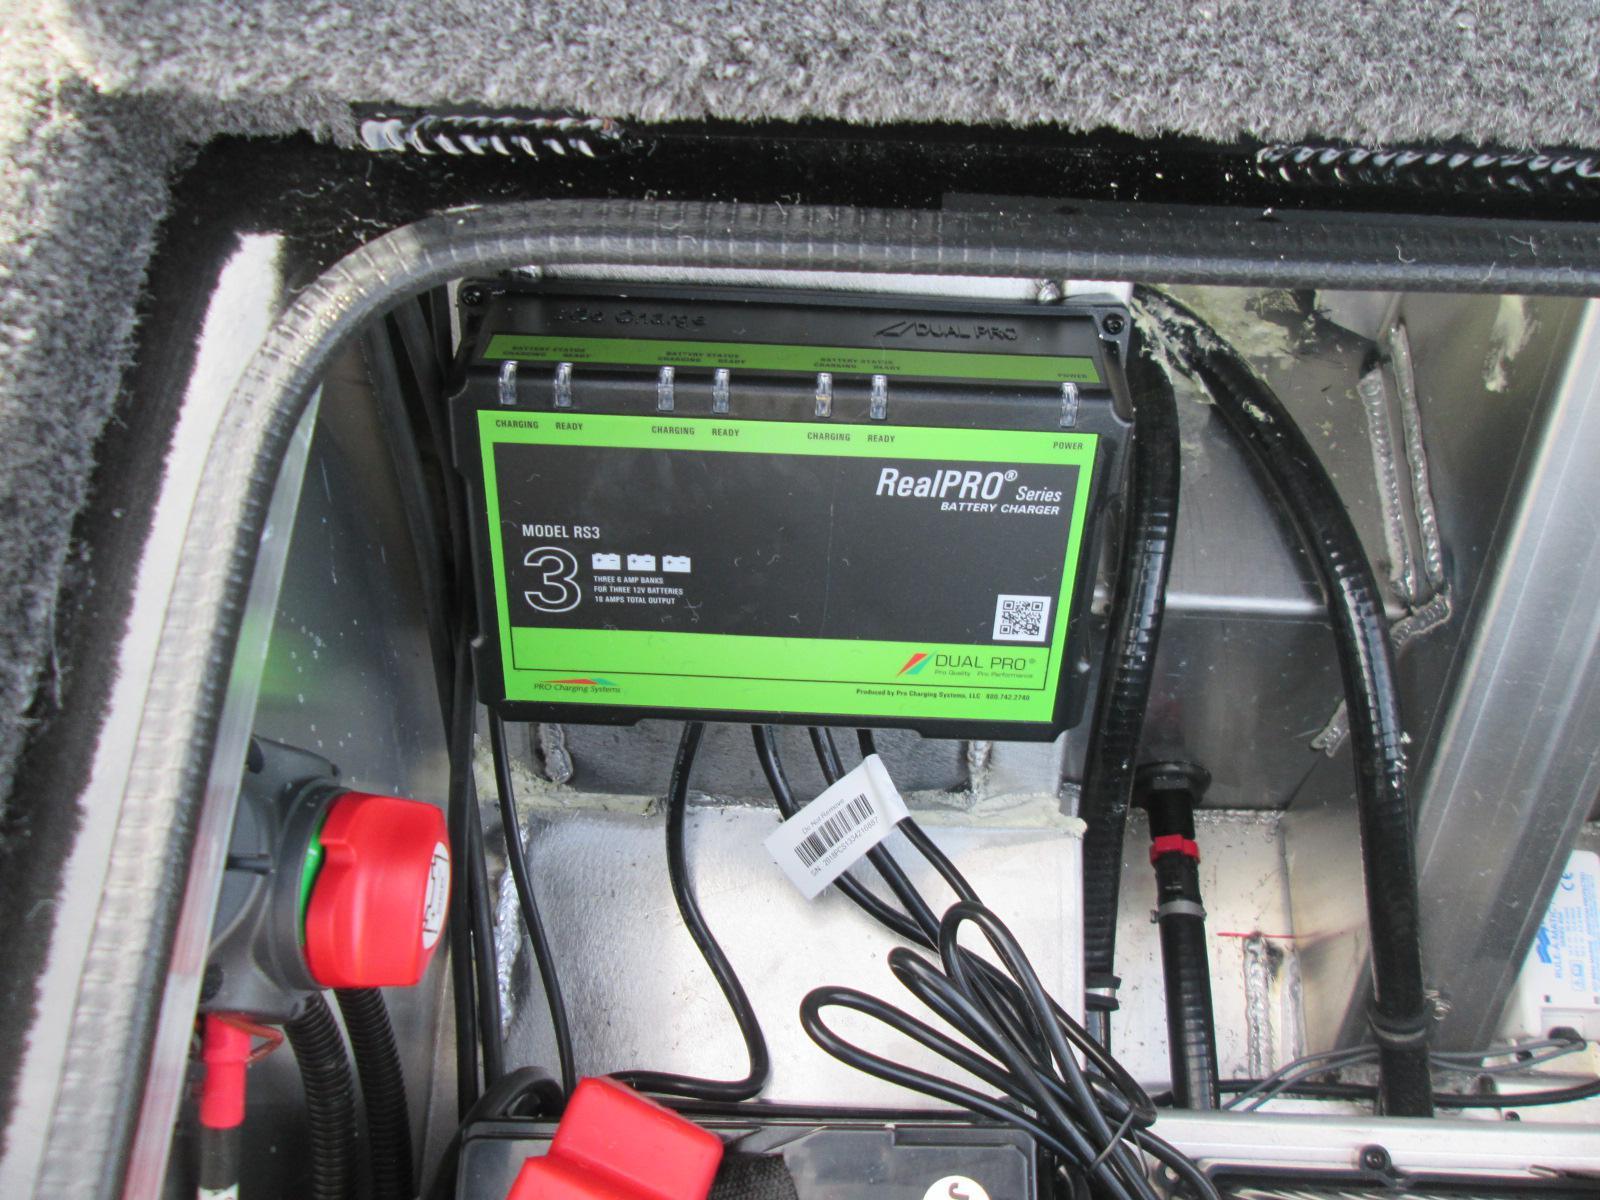 24 Volt Trolling Motor Plug Along With Mercury Smartcraft Gauge Wiring